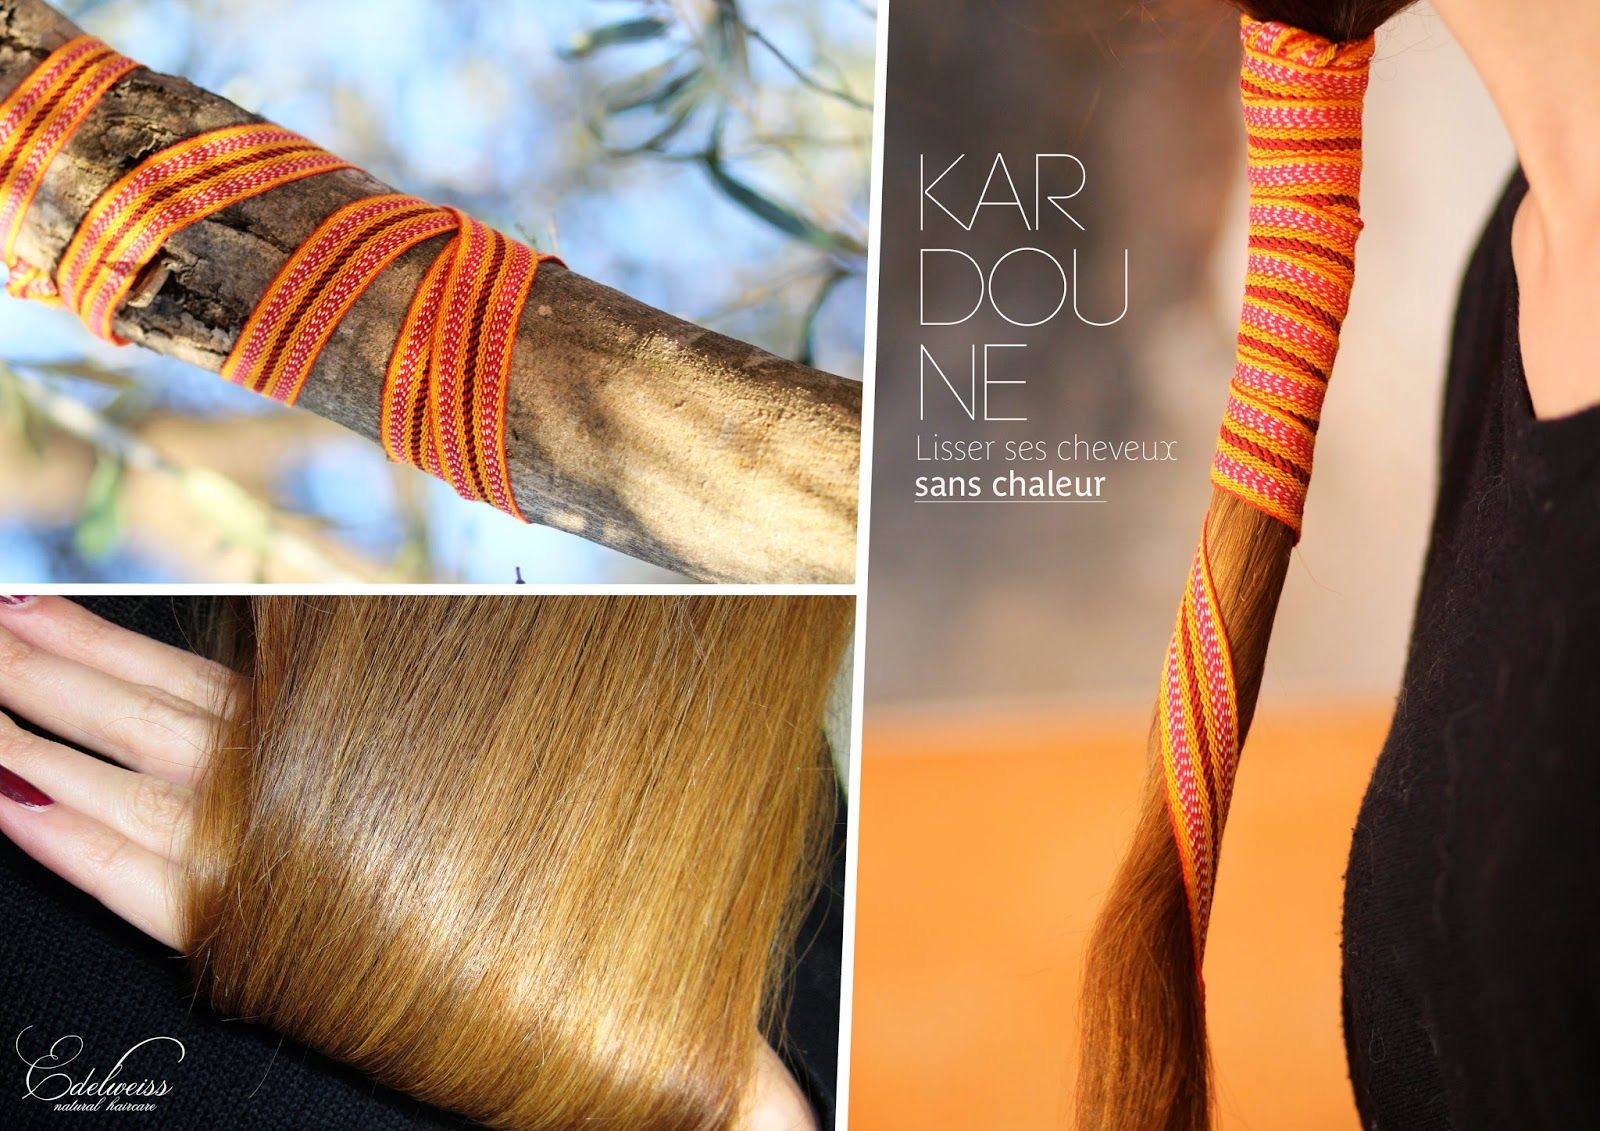 15 Astuces Coiffures Simples Et Peu Connues Cheveux Lisse Astuces De Coiffure Coiffures Simples